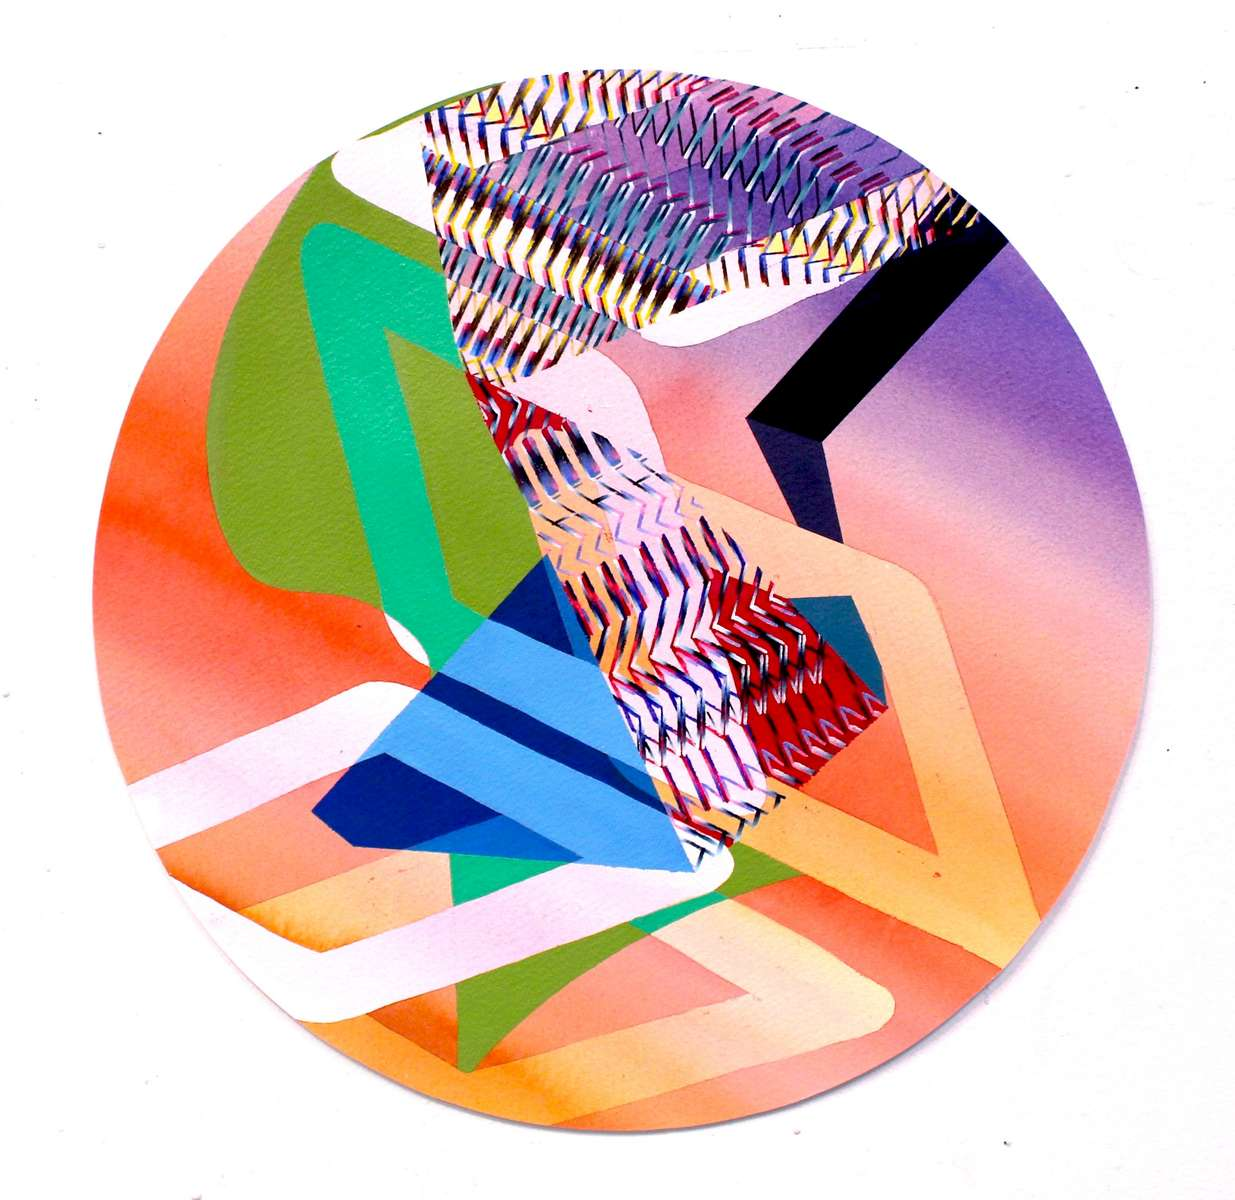 Vanessa IrzykNavigate, 2016Acrylic on watercolor paper17.25 inches in diameter